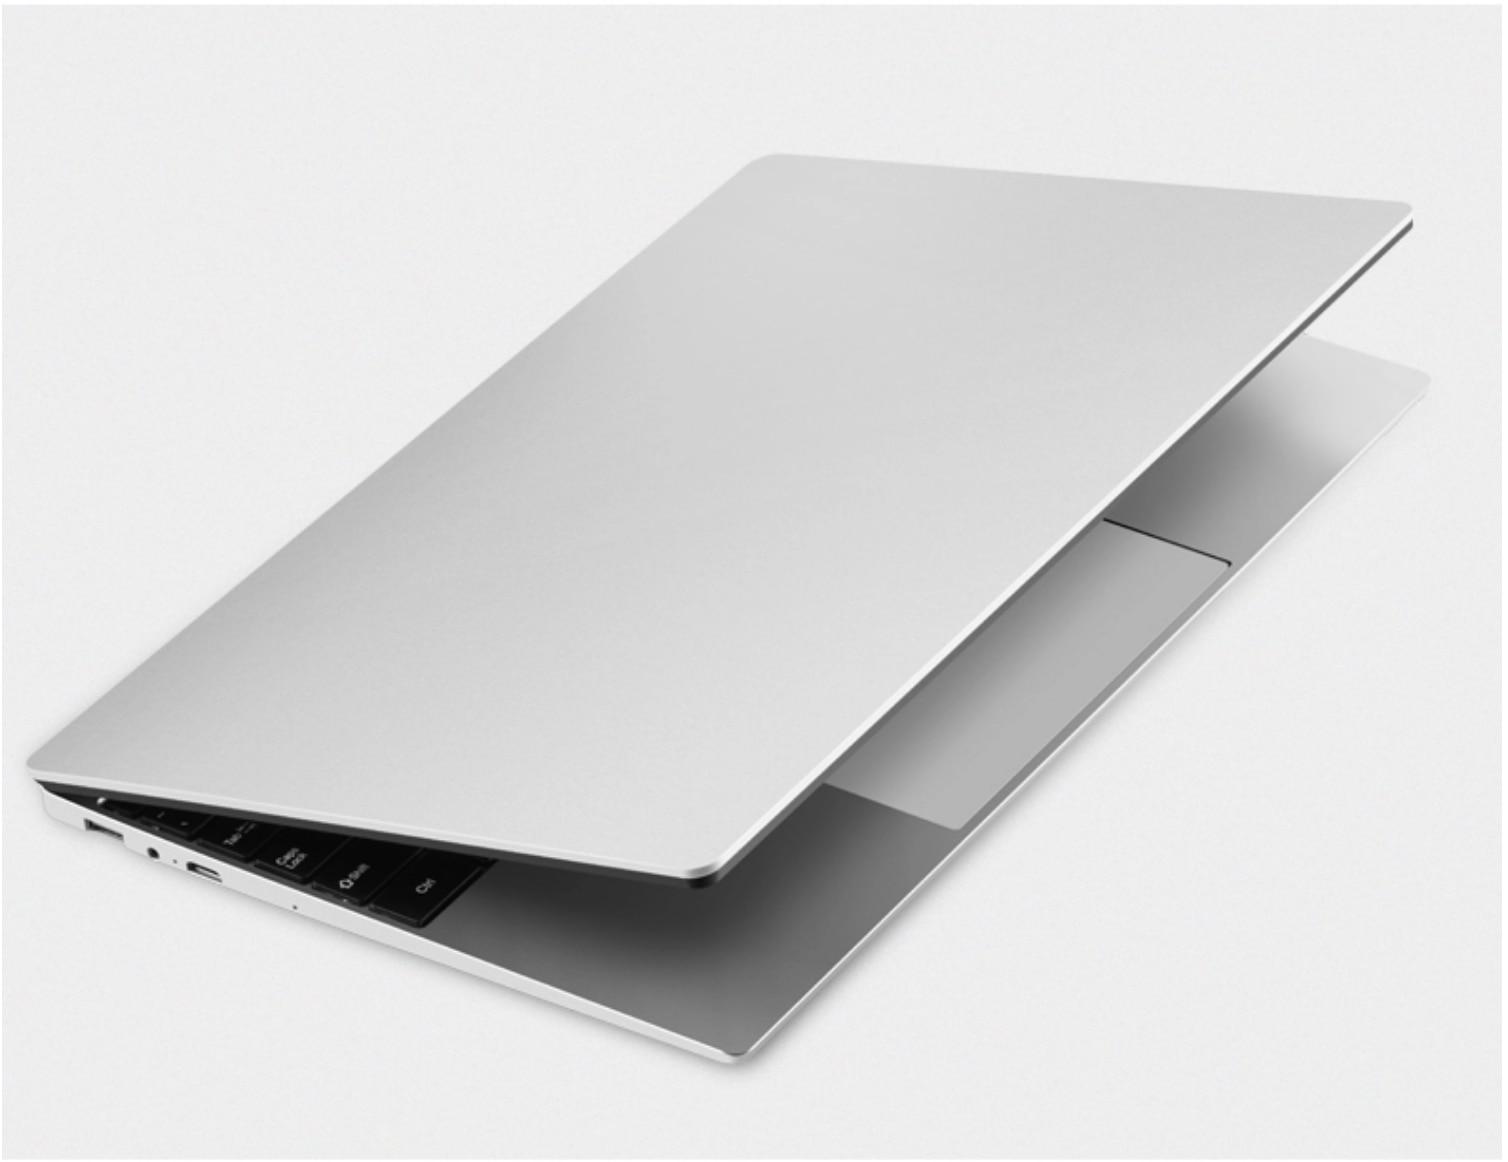 14 Inch Mi Laptop With Notebook I5-10210 8G 512G 2G 8GB RAM 512GB Laptop